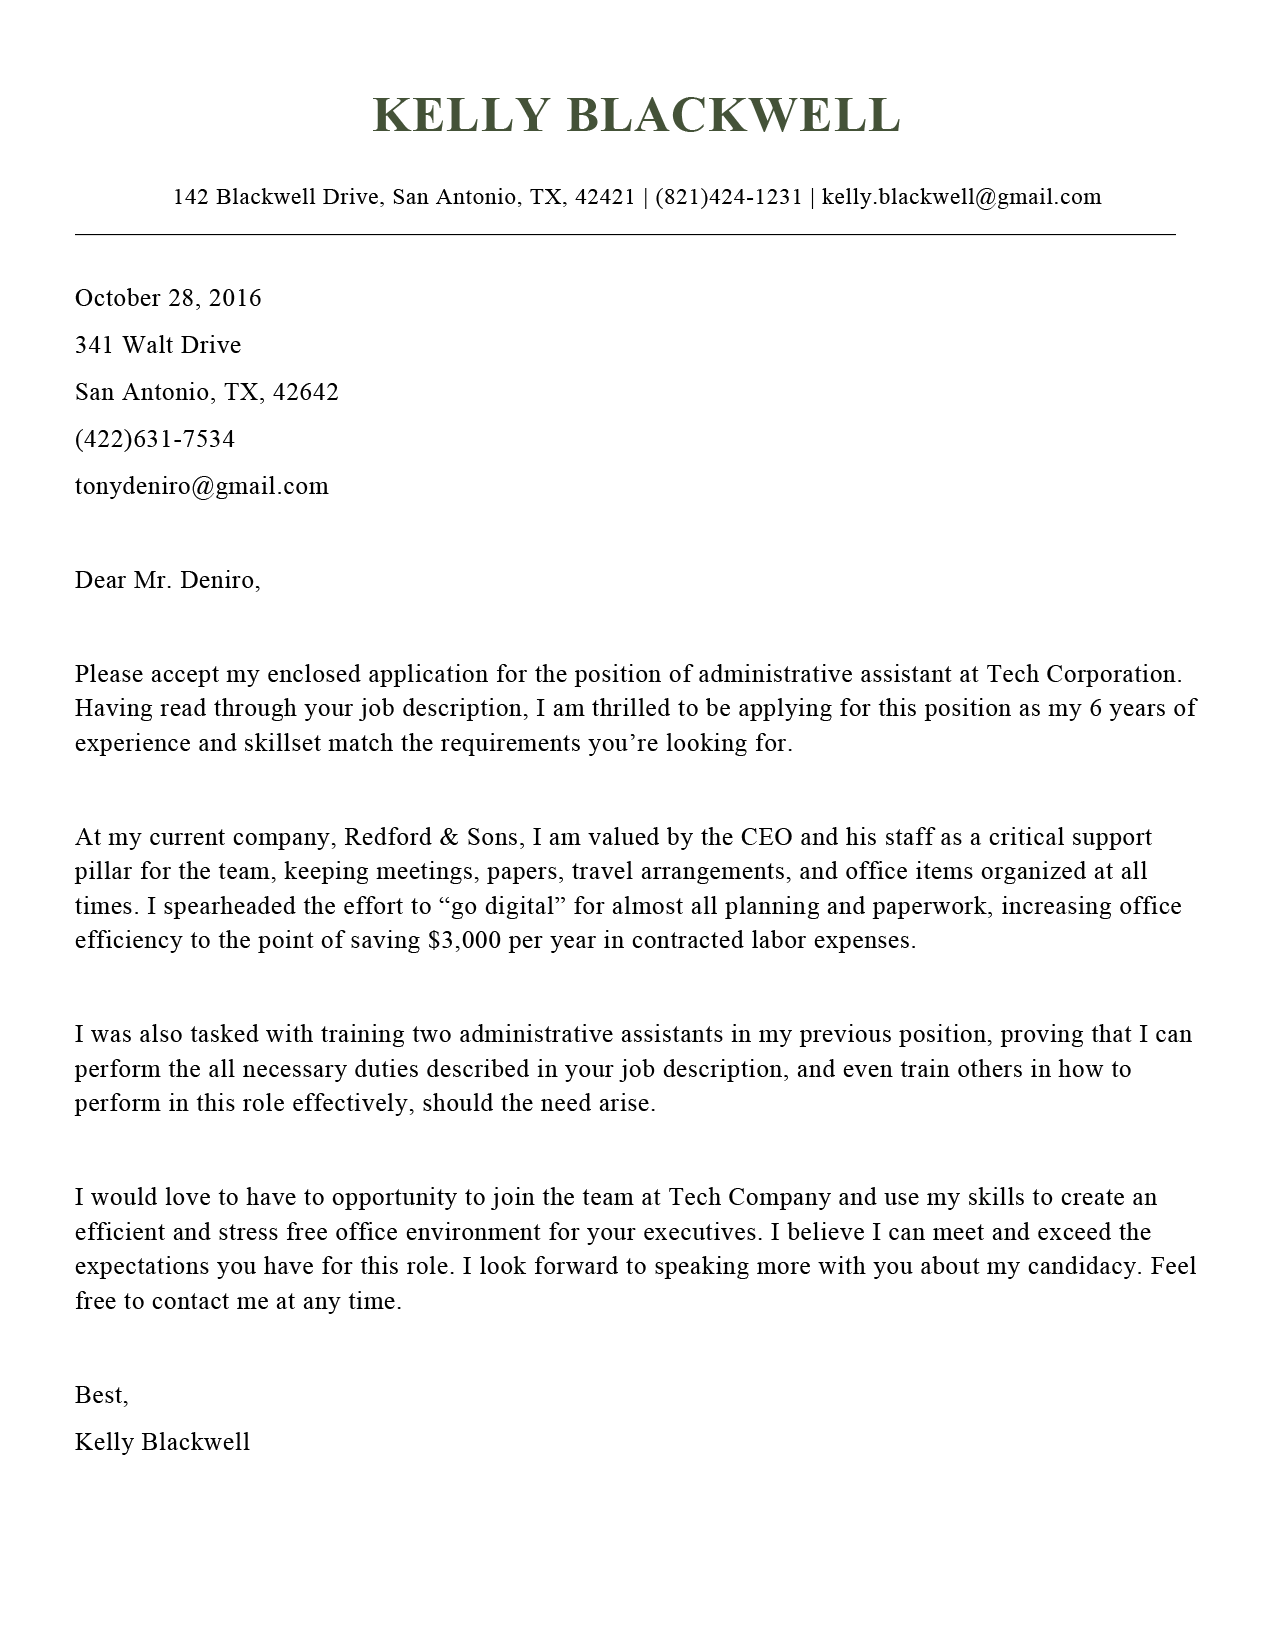 Cover Letter Builder Online Free Lv Crelegant Com